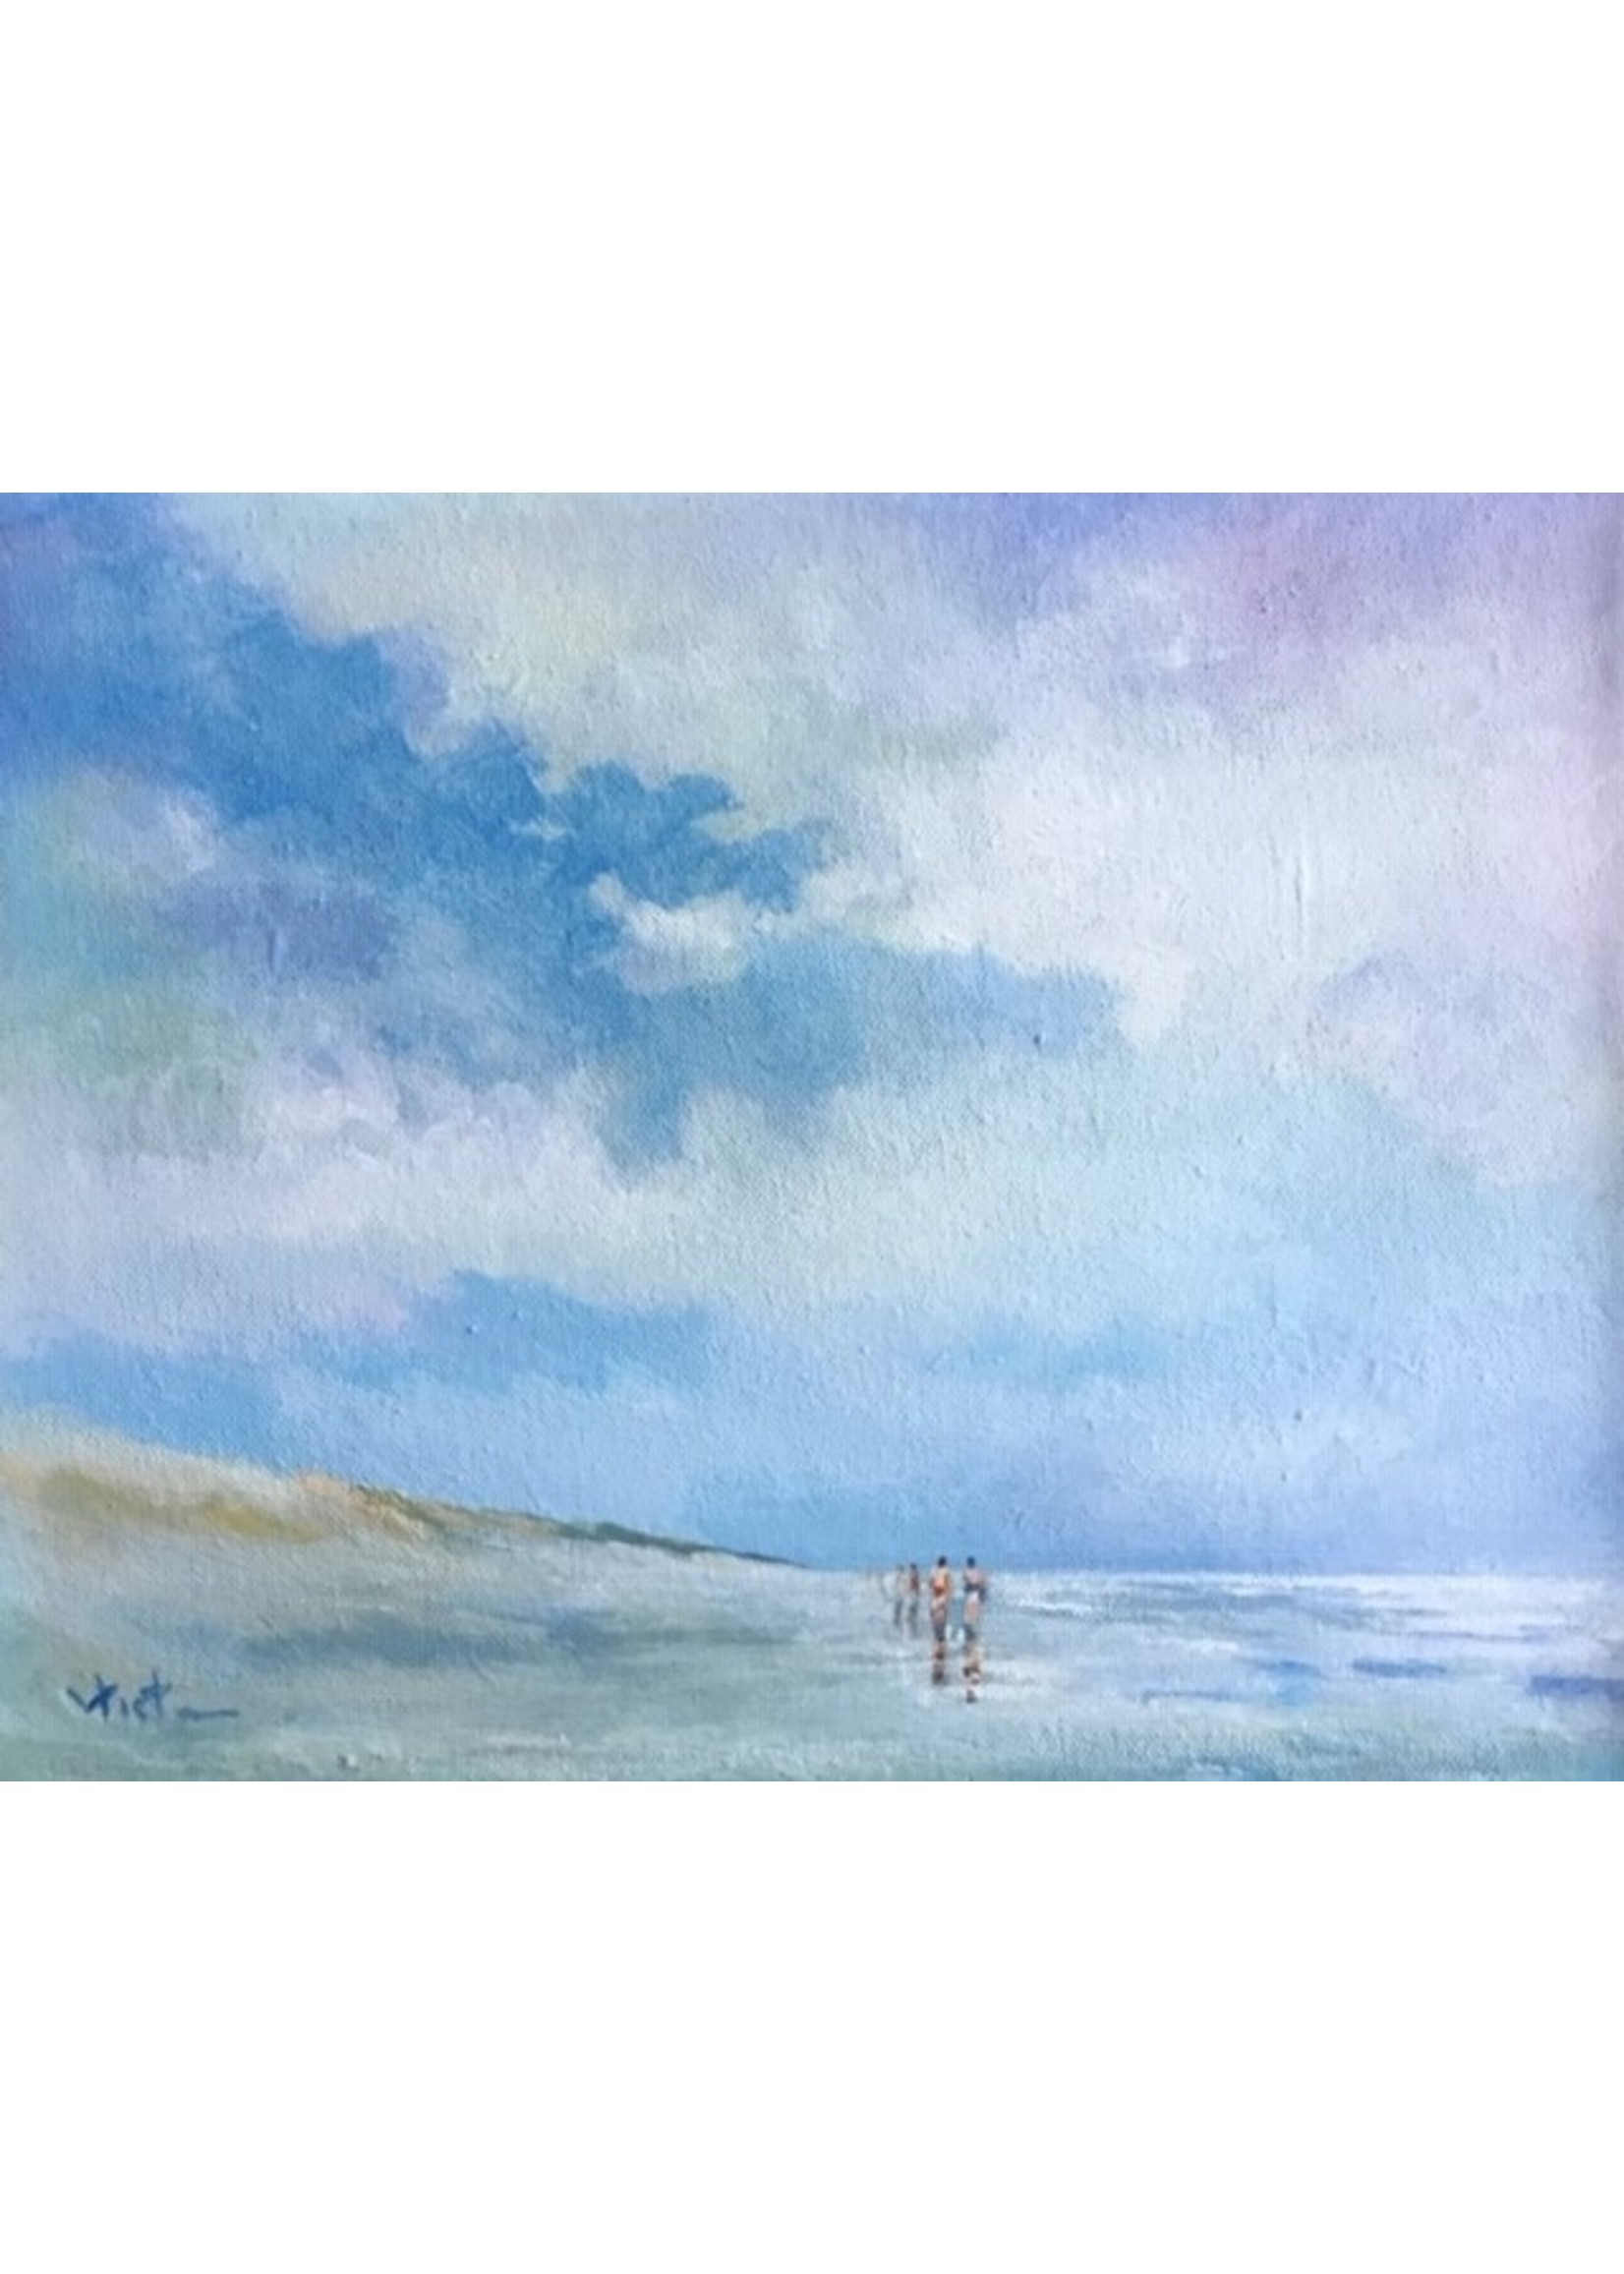 'Nordseesommer' - Kees Vlietman (Acryl auf Leinwand)